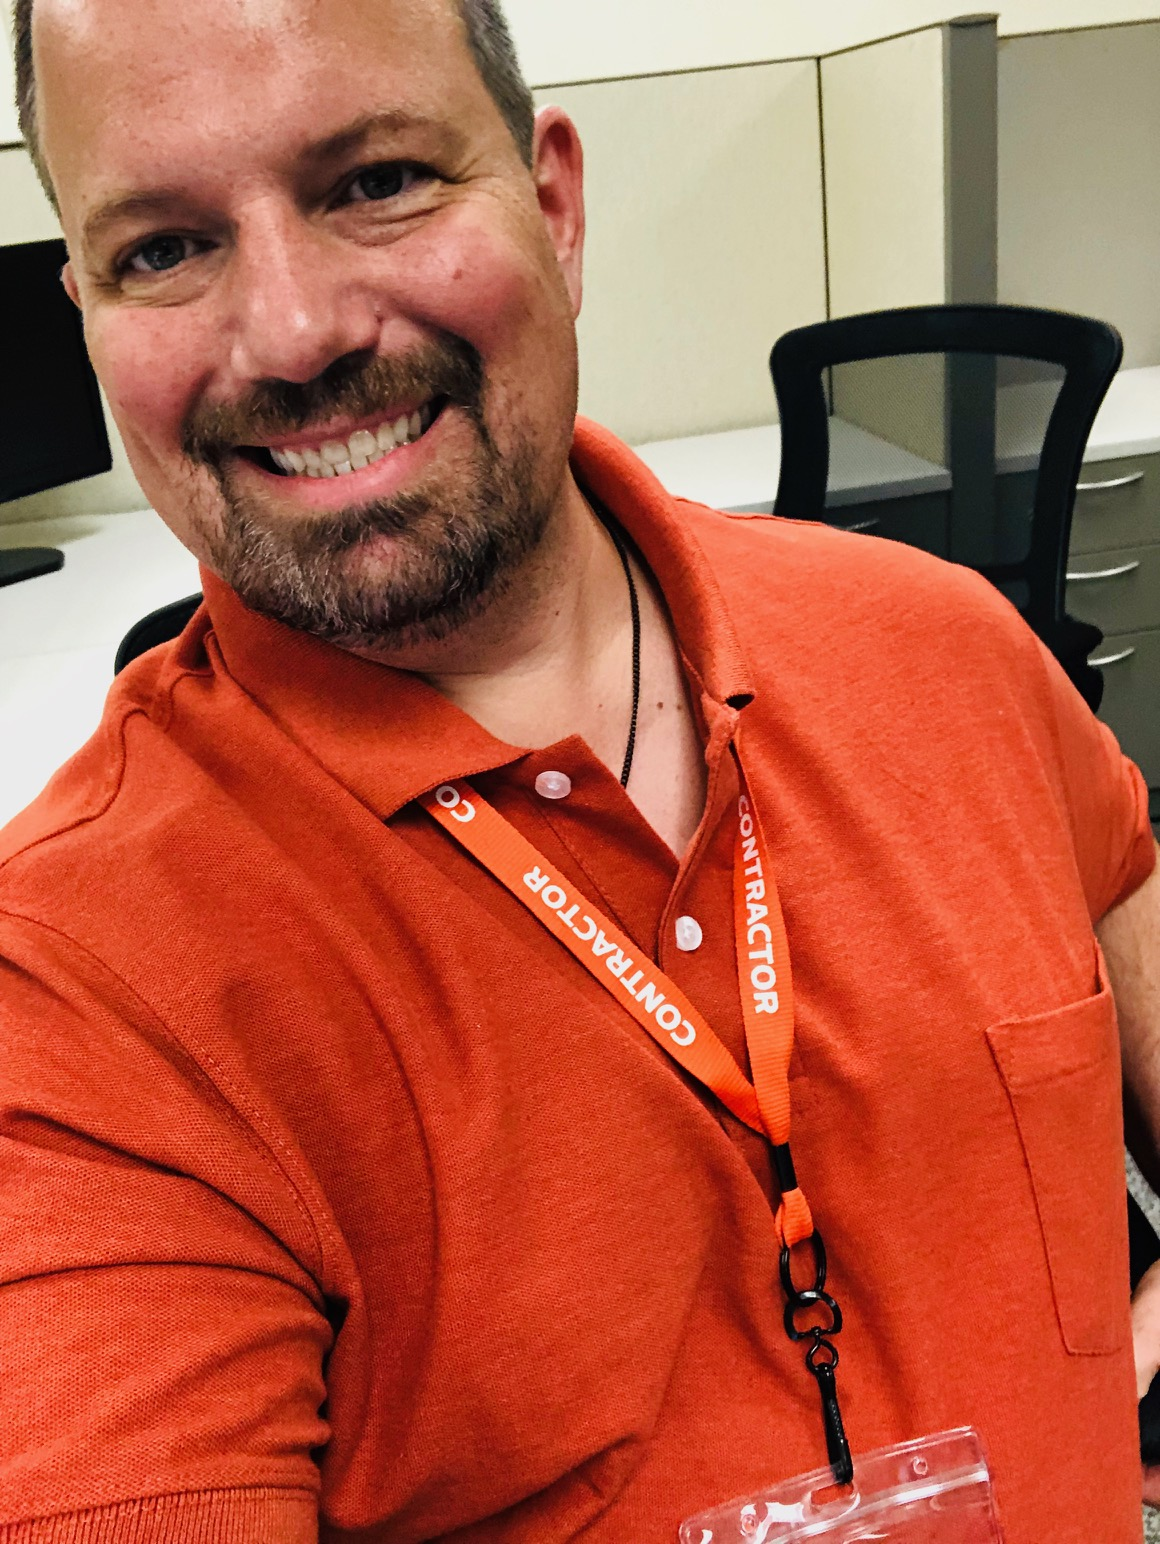 The 2 XL orange polo from DXL. Next shirt size down—Kohl's next door.